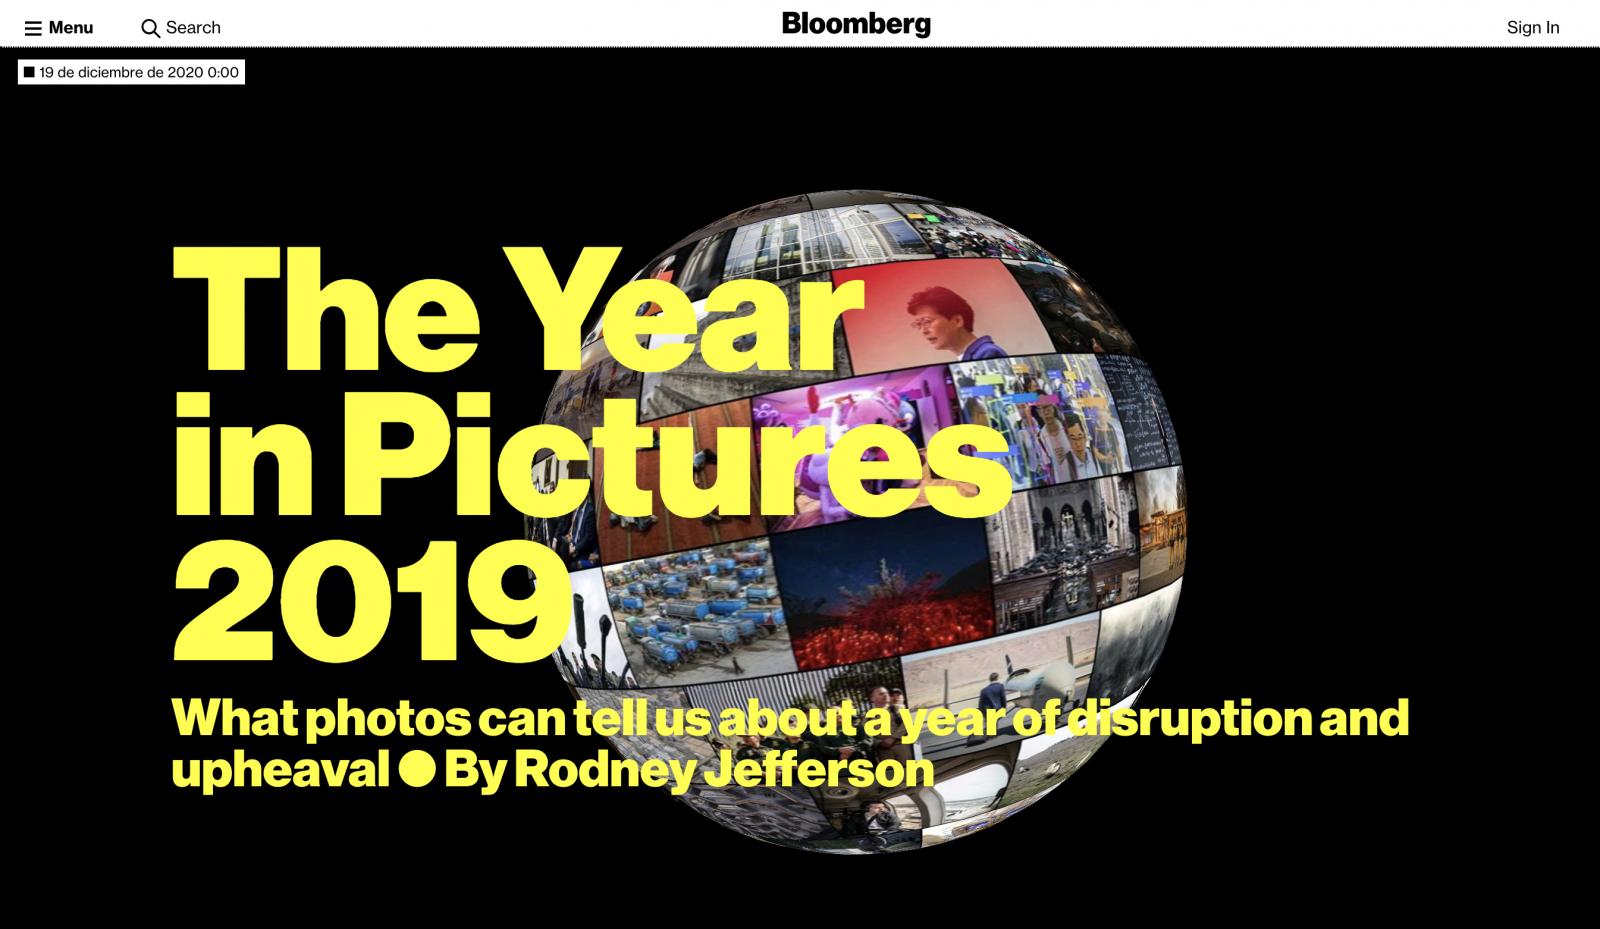 Photography image - Loading Captura_de_pantalla_2019-12-23_a_la(s)_18.16.42.png